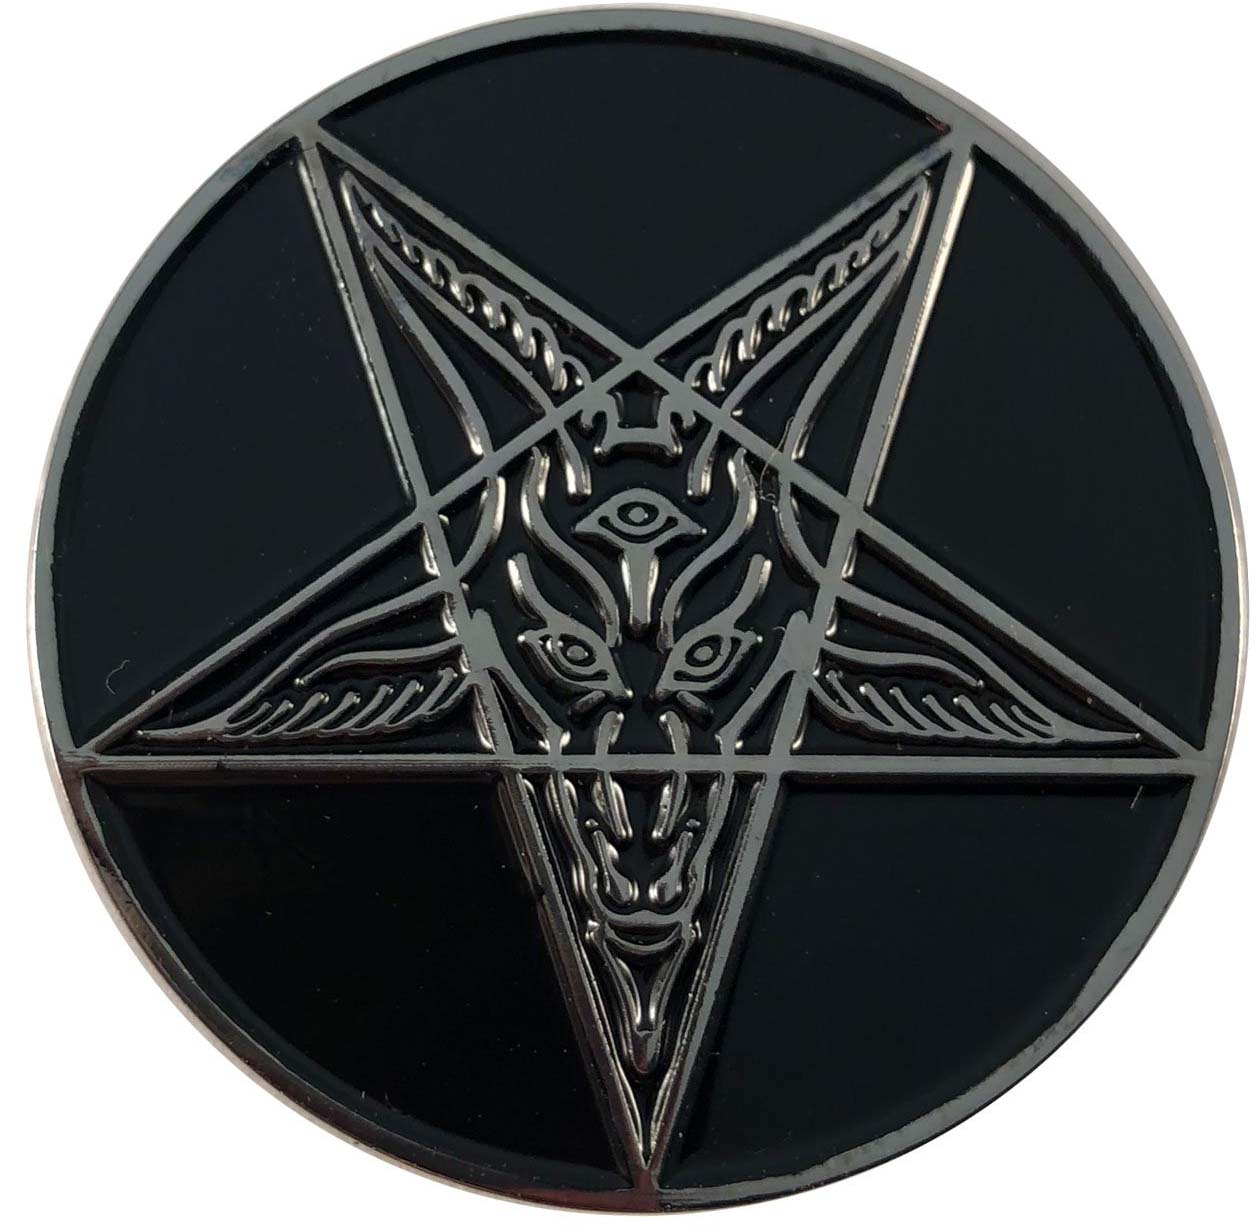 Goat Baphomet Enamel Pin Badge by Kreepsville 666 (MP208)